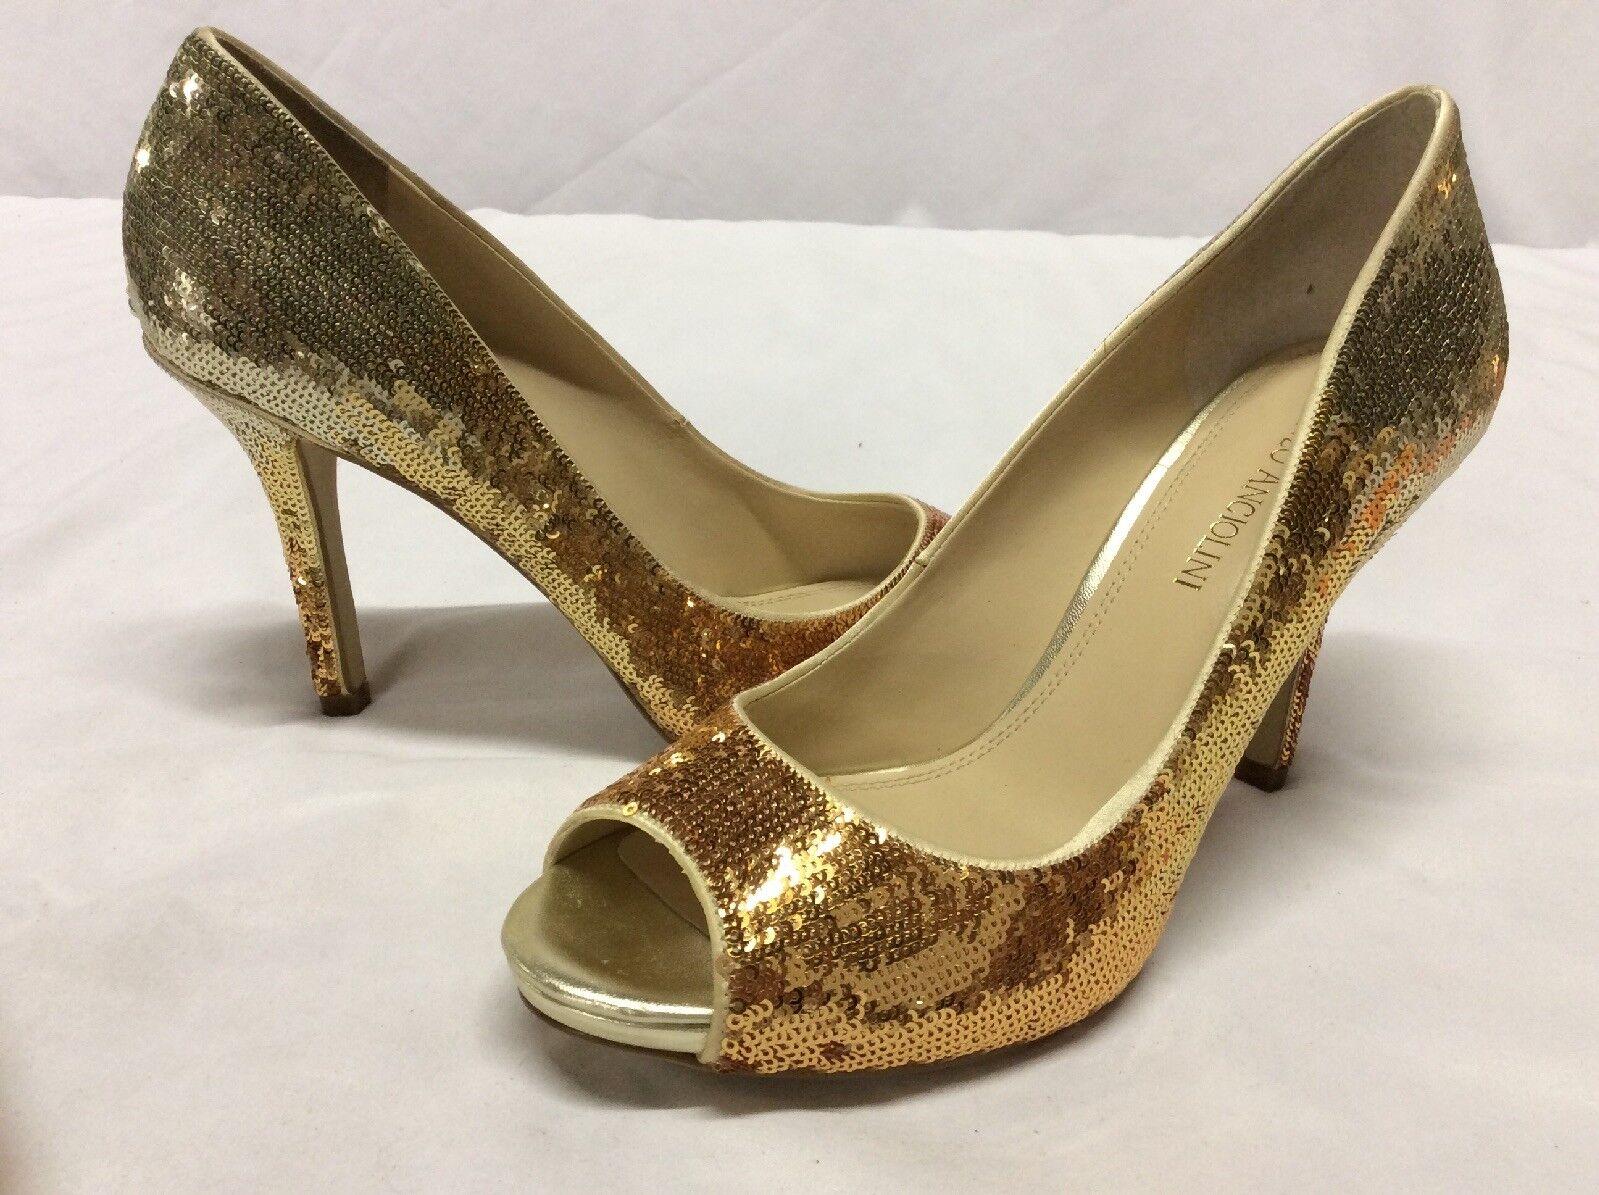 Enzo Angiolini EAMAIVEN Women's Heels shoes,Bridal.gold, Size 7.5 M M M ..DRESS5 f21e27